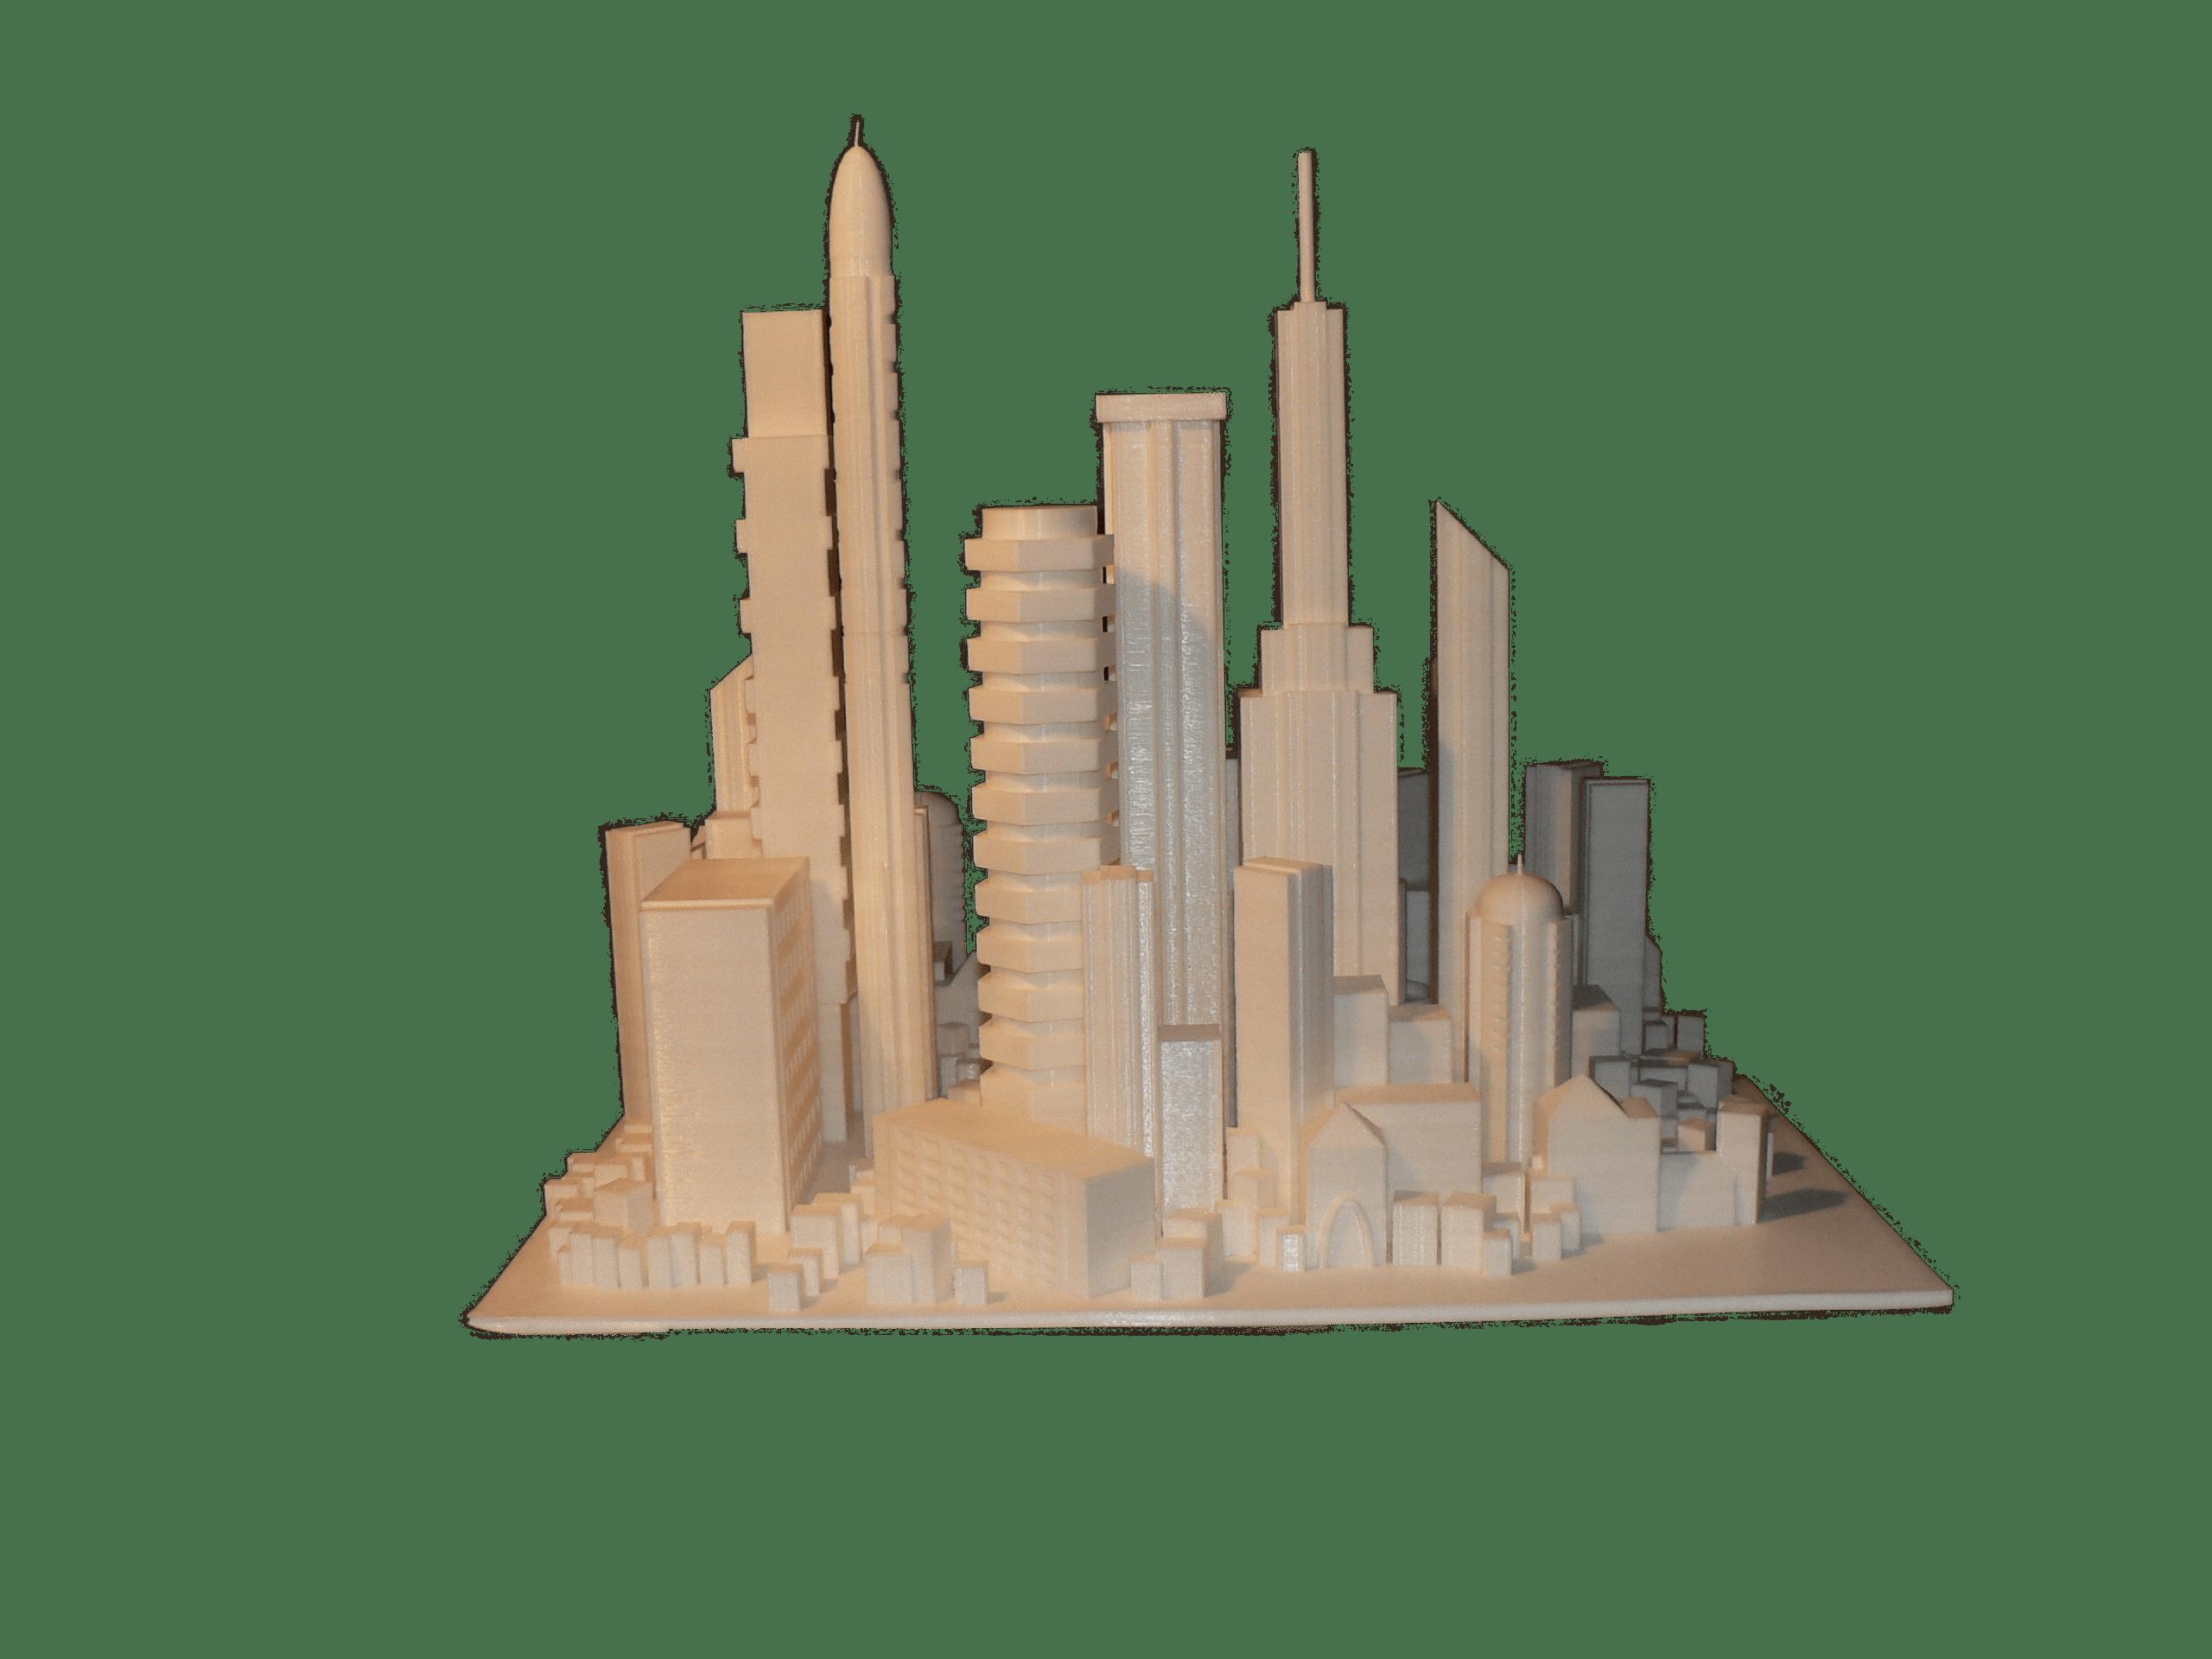 Maquette 60 x 60 x 60 cm